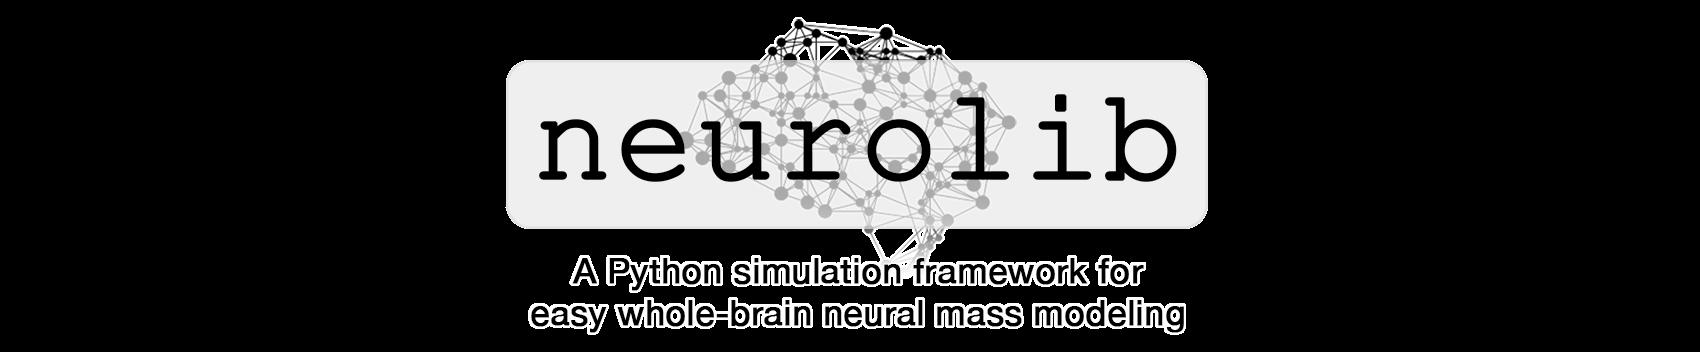 neurolib